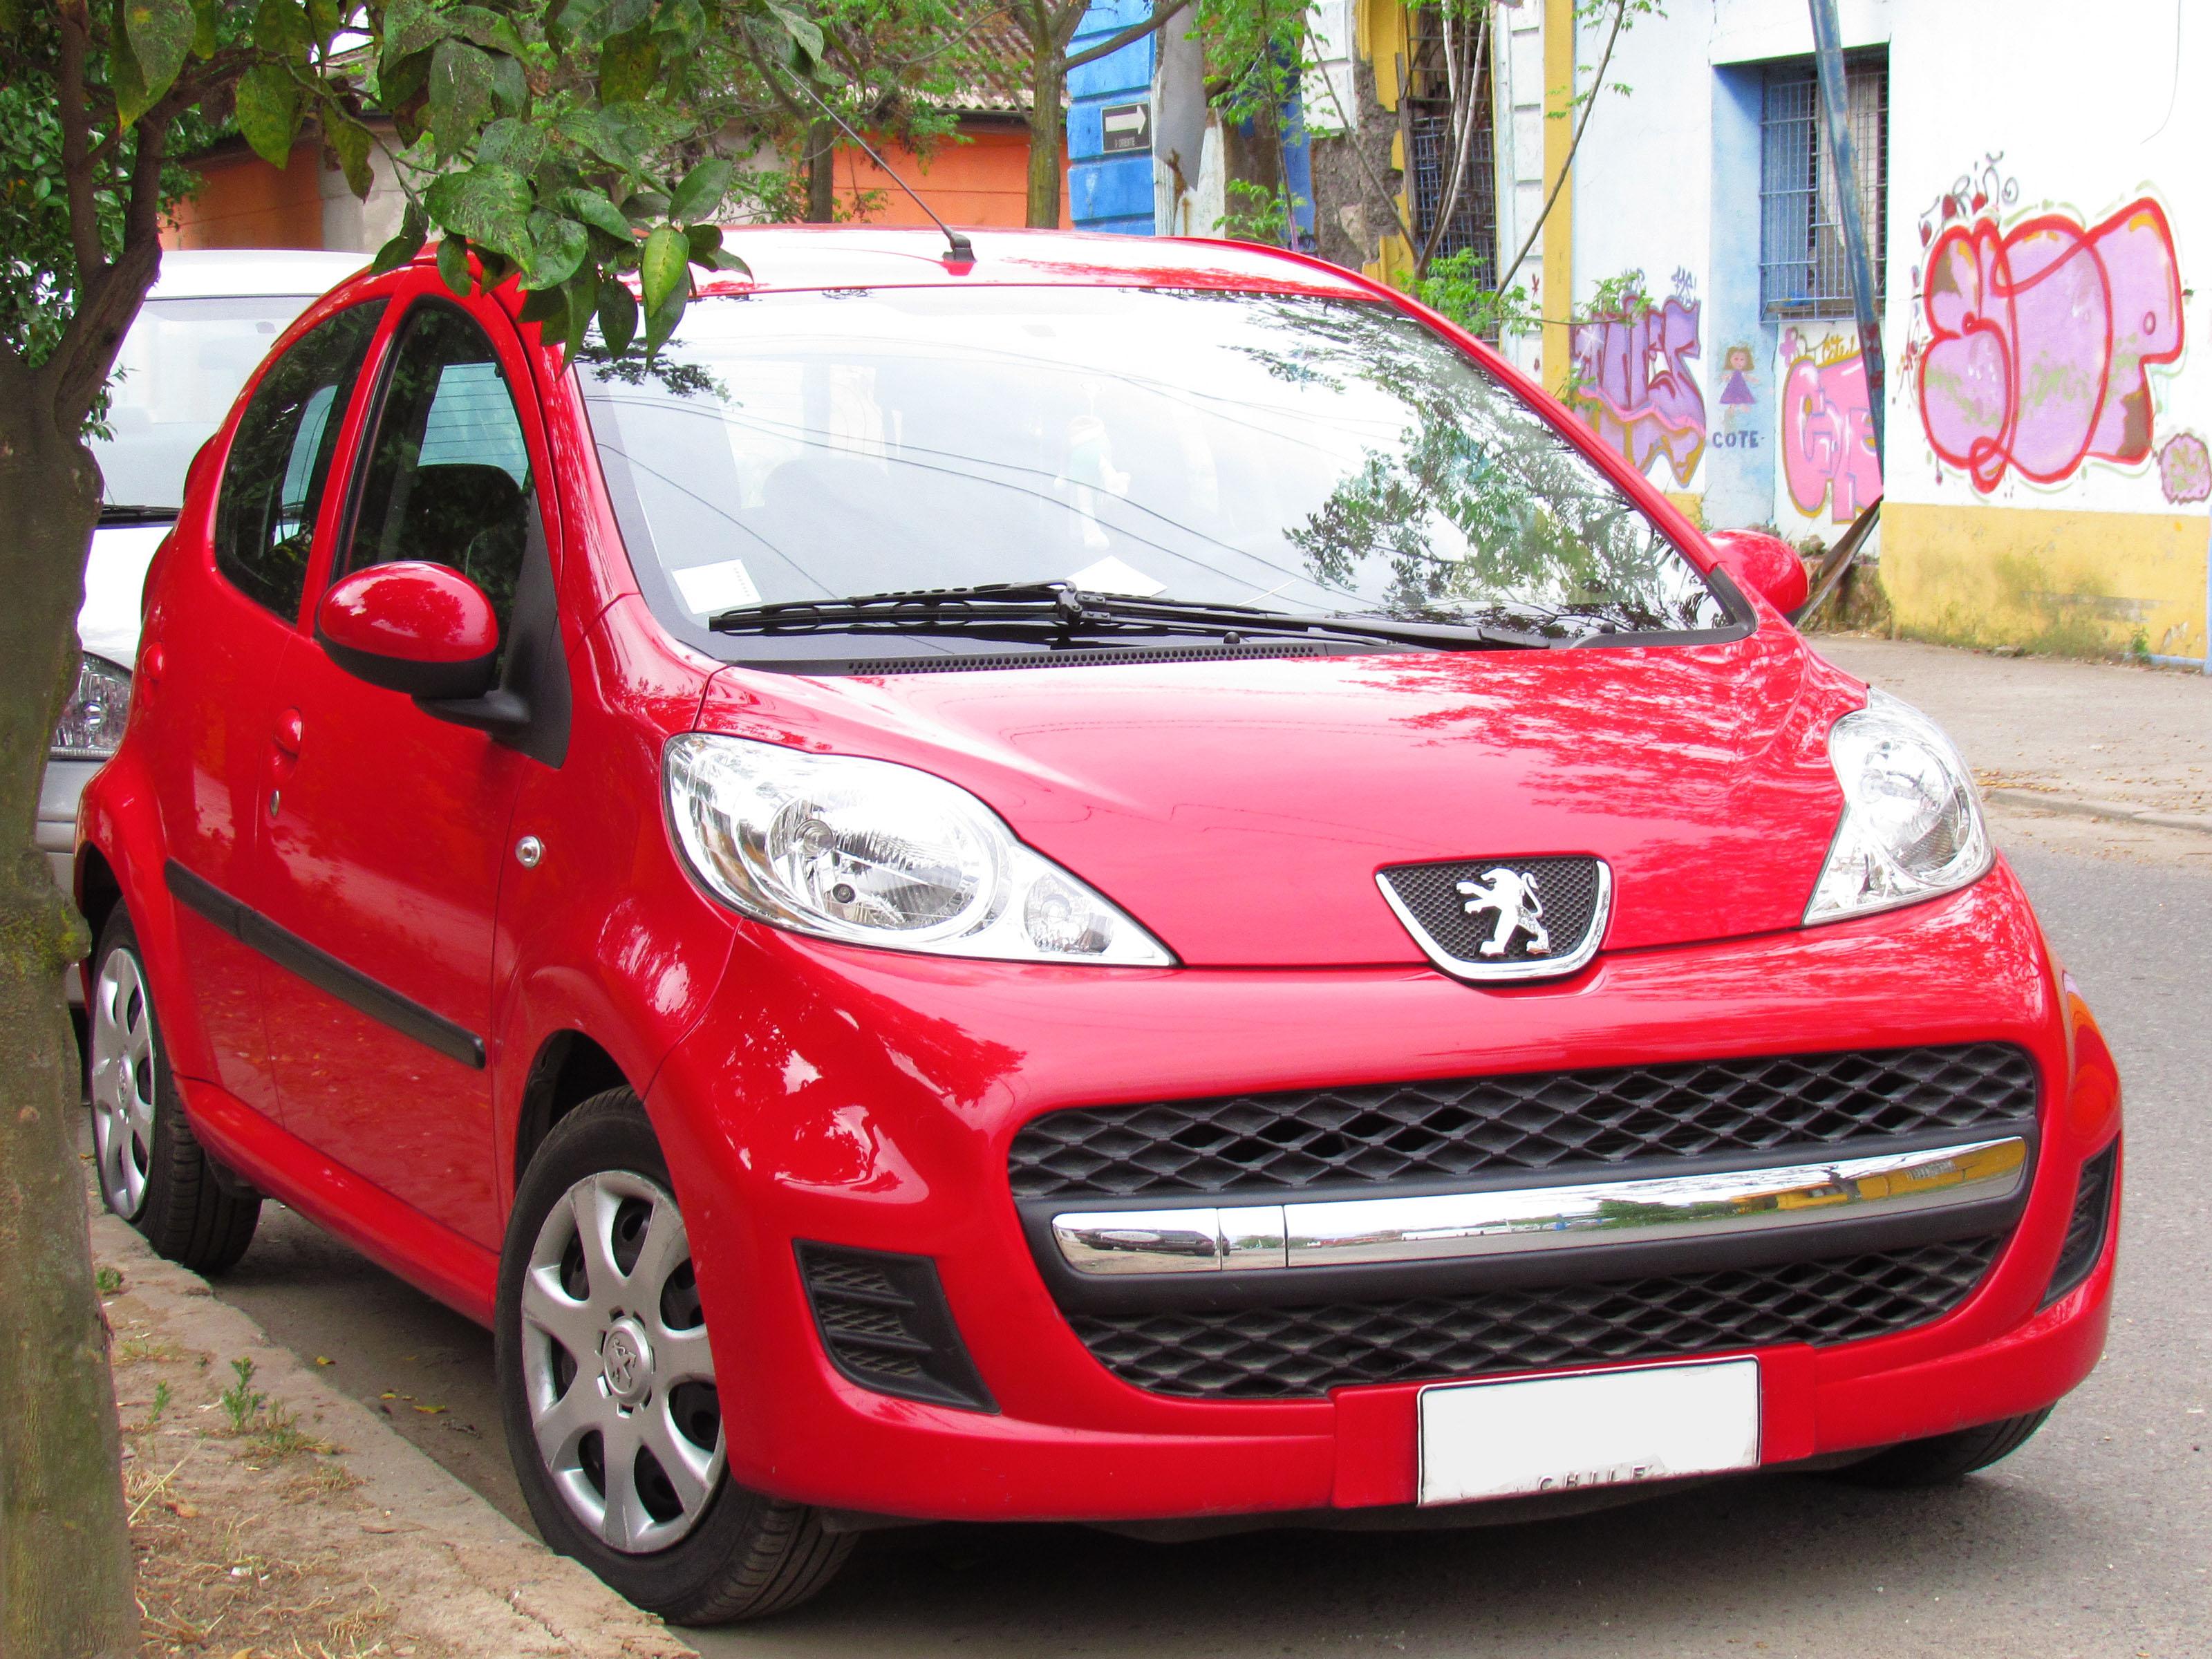 File Peugeot 107 1 0 Active 2010 11863122825 Jpg Wikimedia Commons